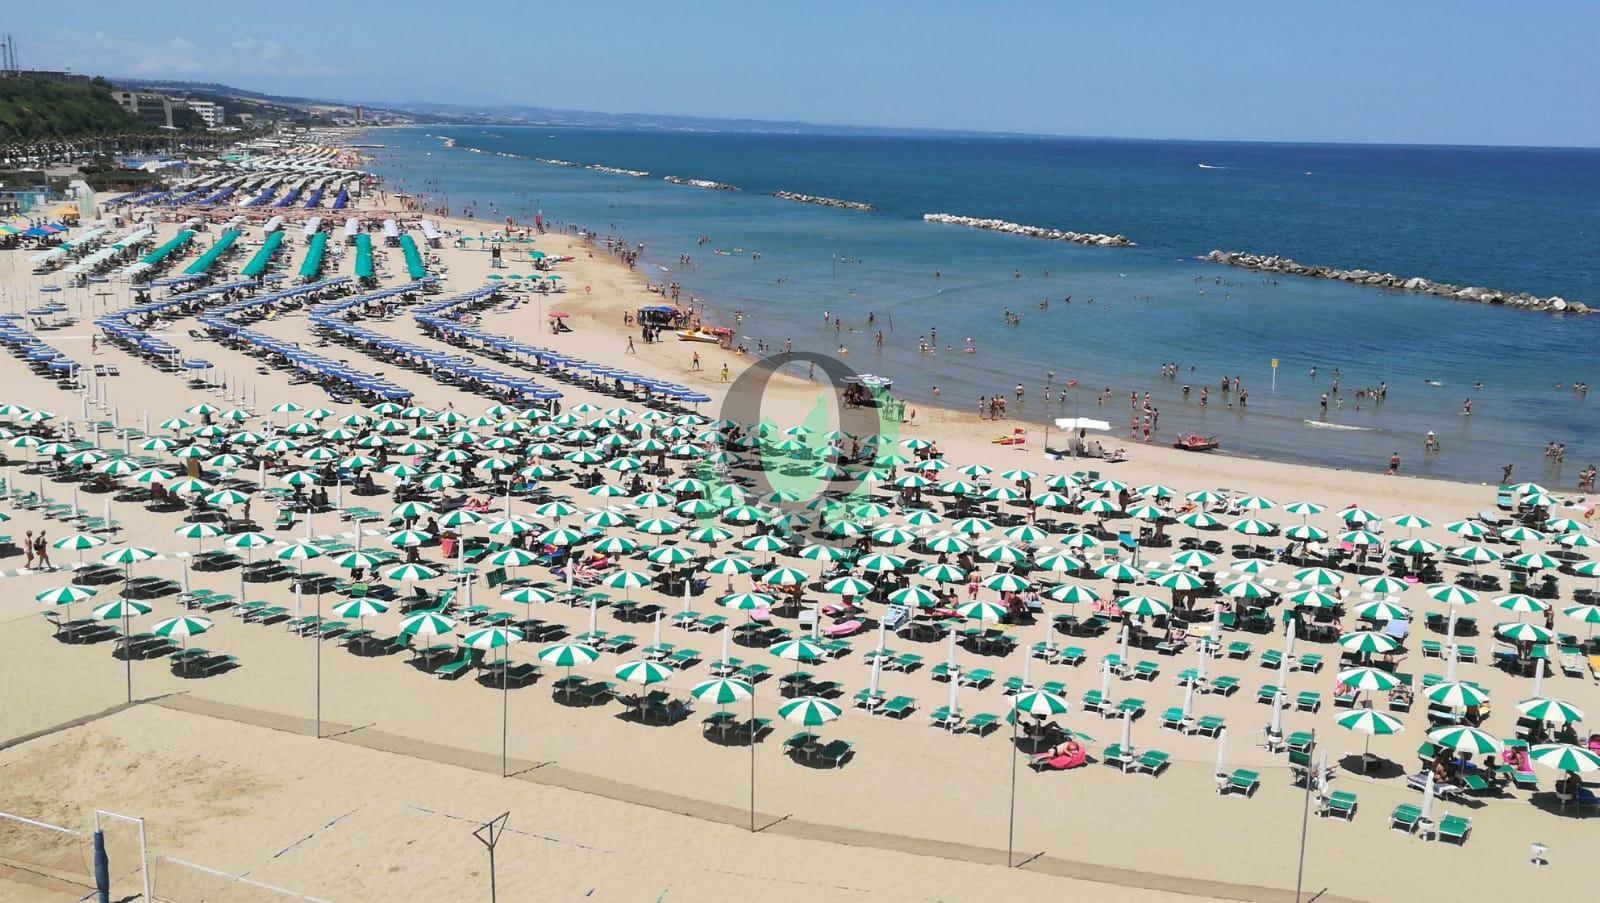 Weekend col solleone, spiagge piene a Termoli